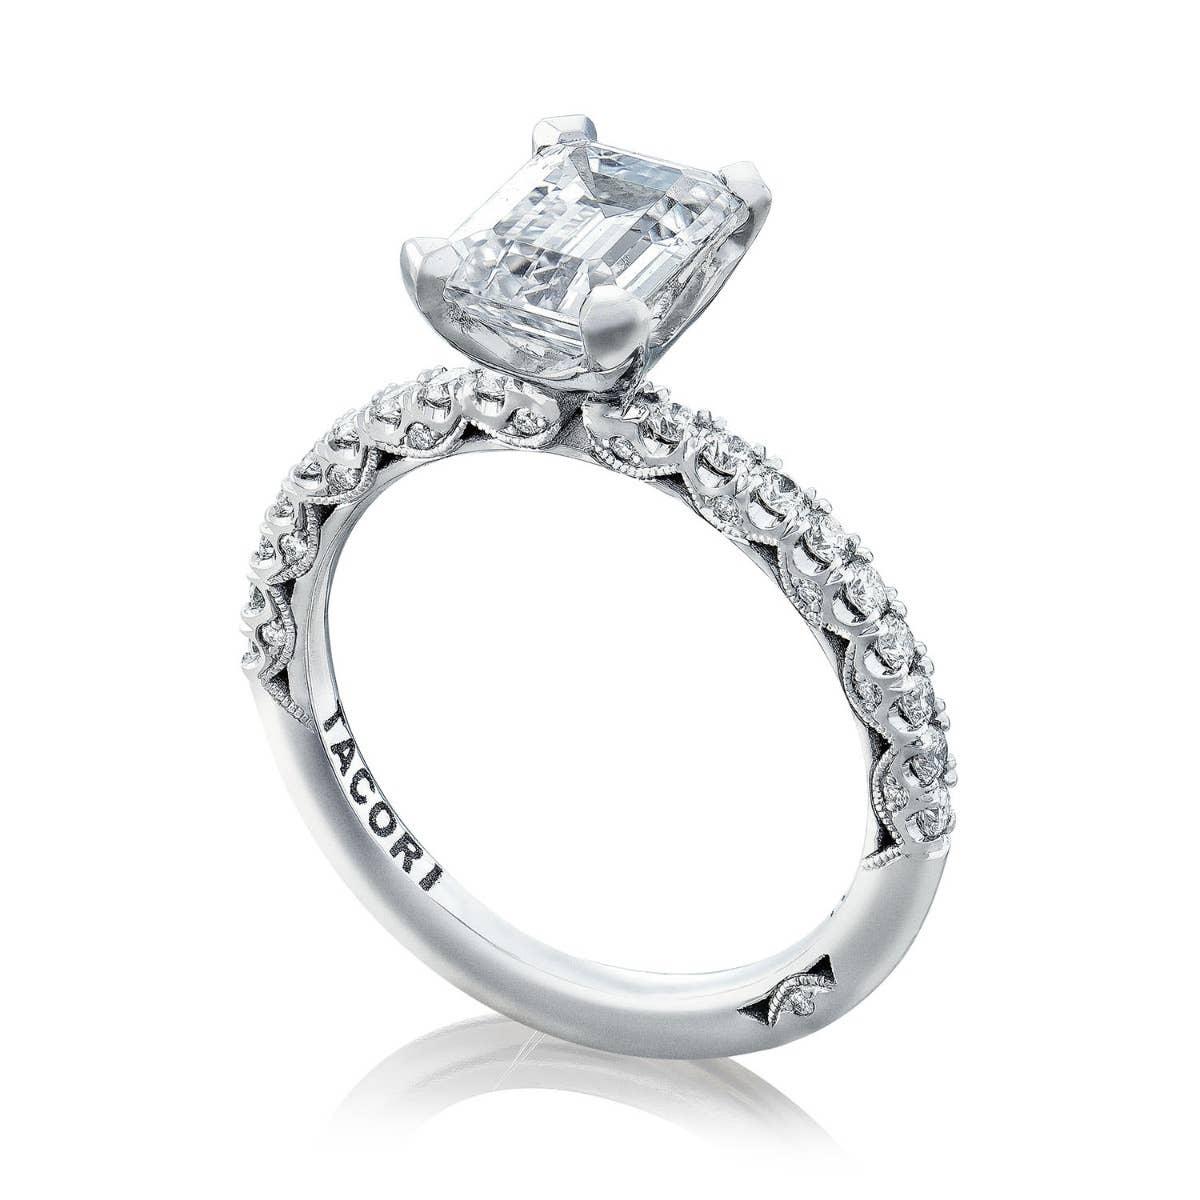 Tacori Engagement Rings - ht2545ec